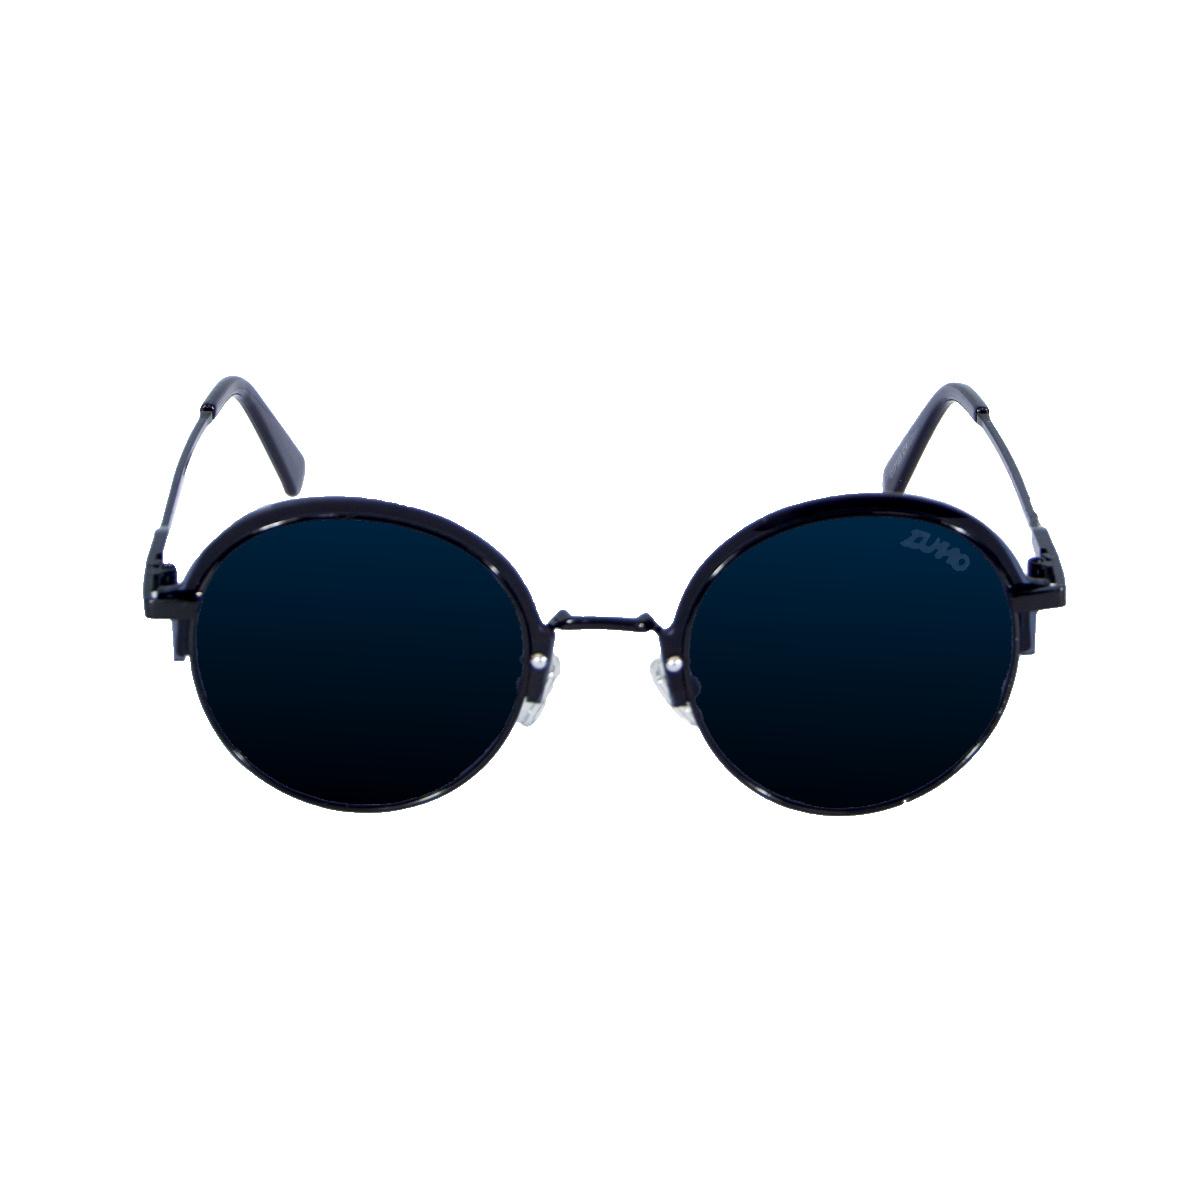 Zumo Sunglasses JURO-QMCJ7165-C1 Black